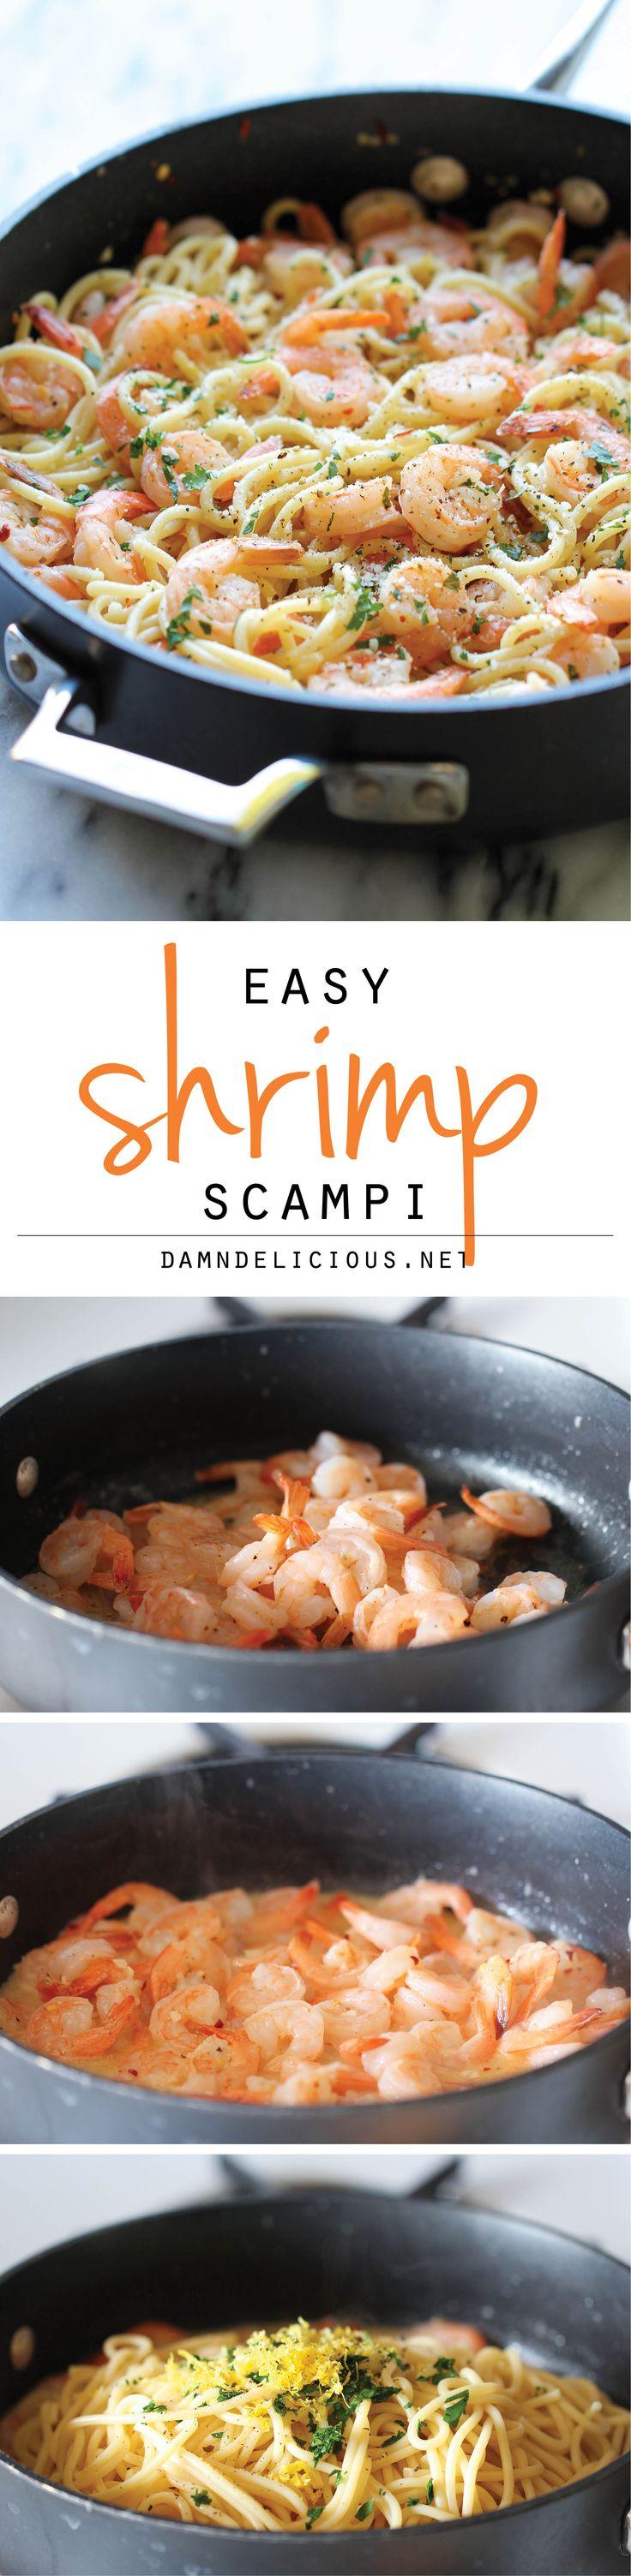 Shrimp Scampi – You wont believe ho